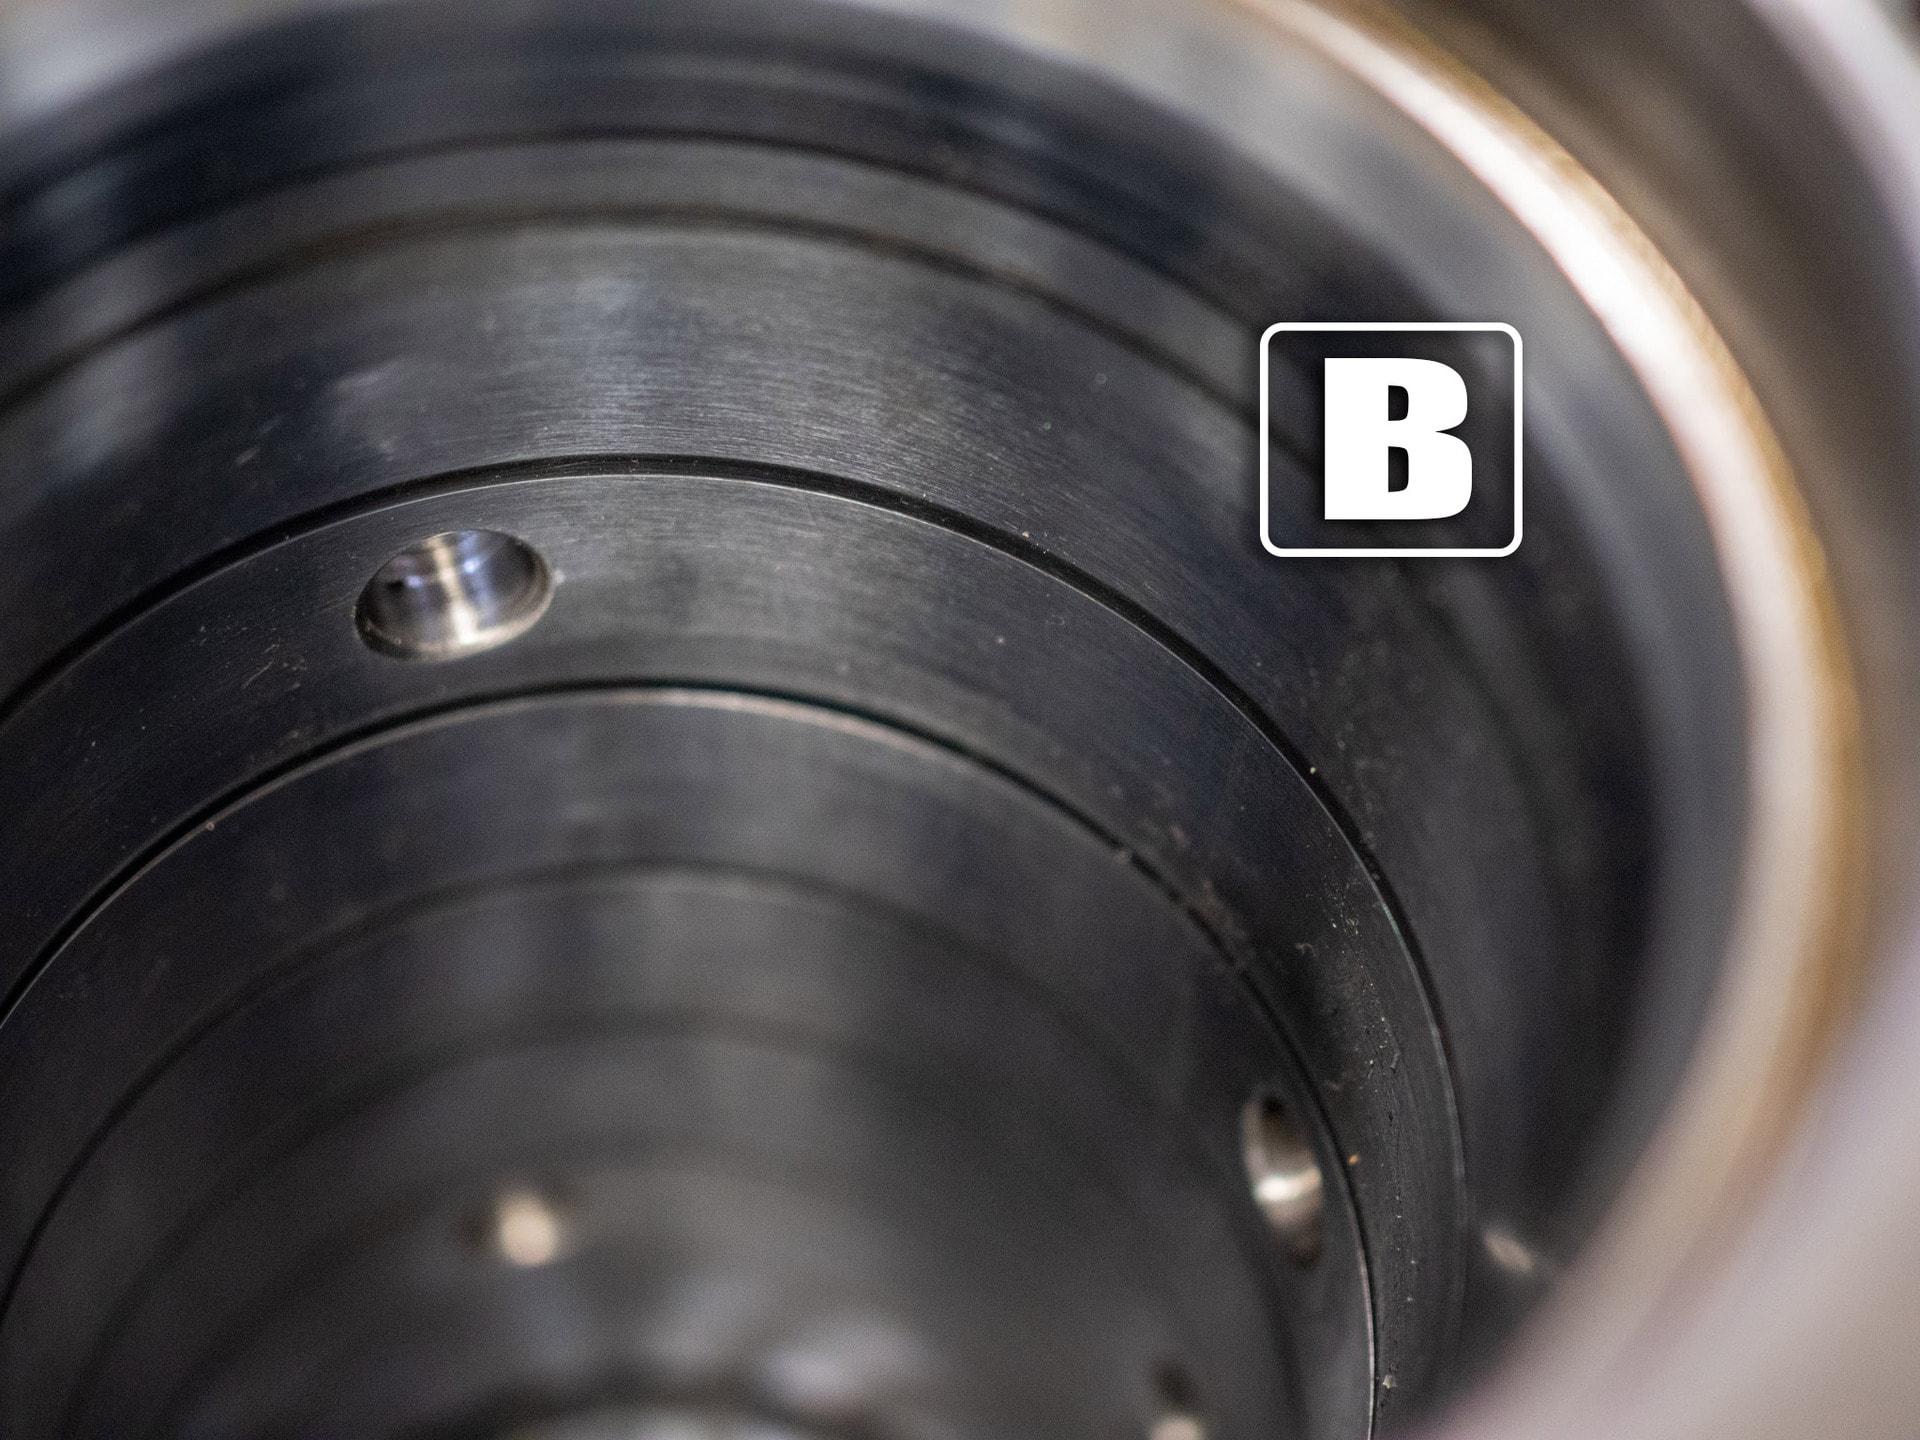 Hydraulic Cylinder Swivel Bore repair Crane Equipment Repair Manufacturing Service Edmonton Canada